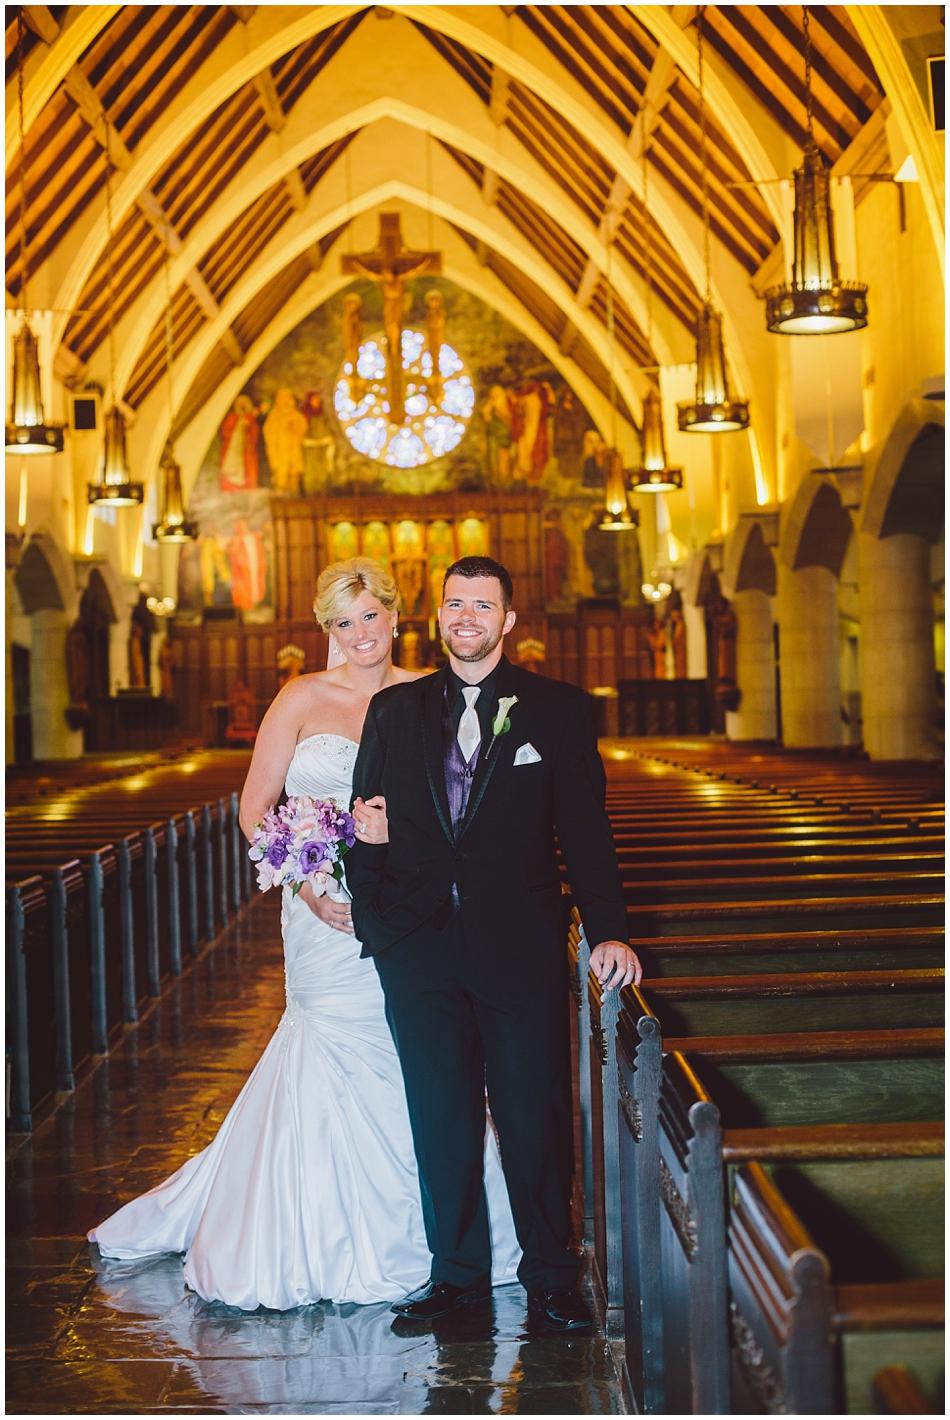 Formal wedding photo at st. margaret mary church omaha, ne